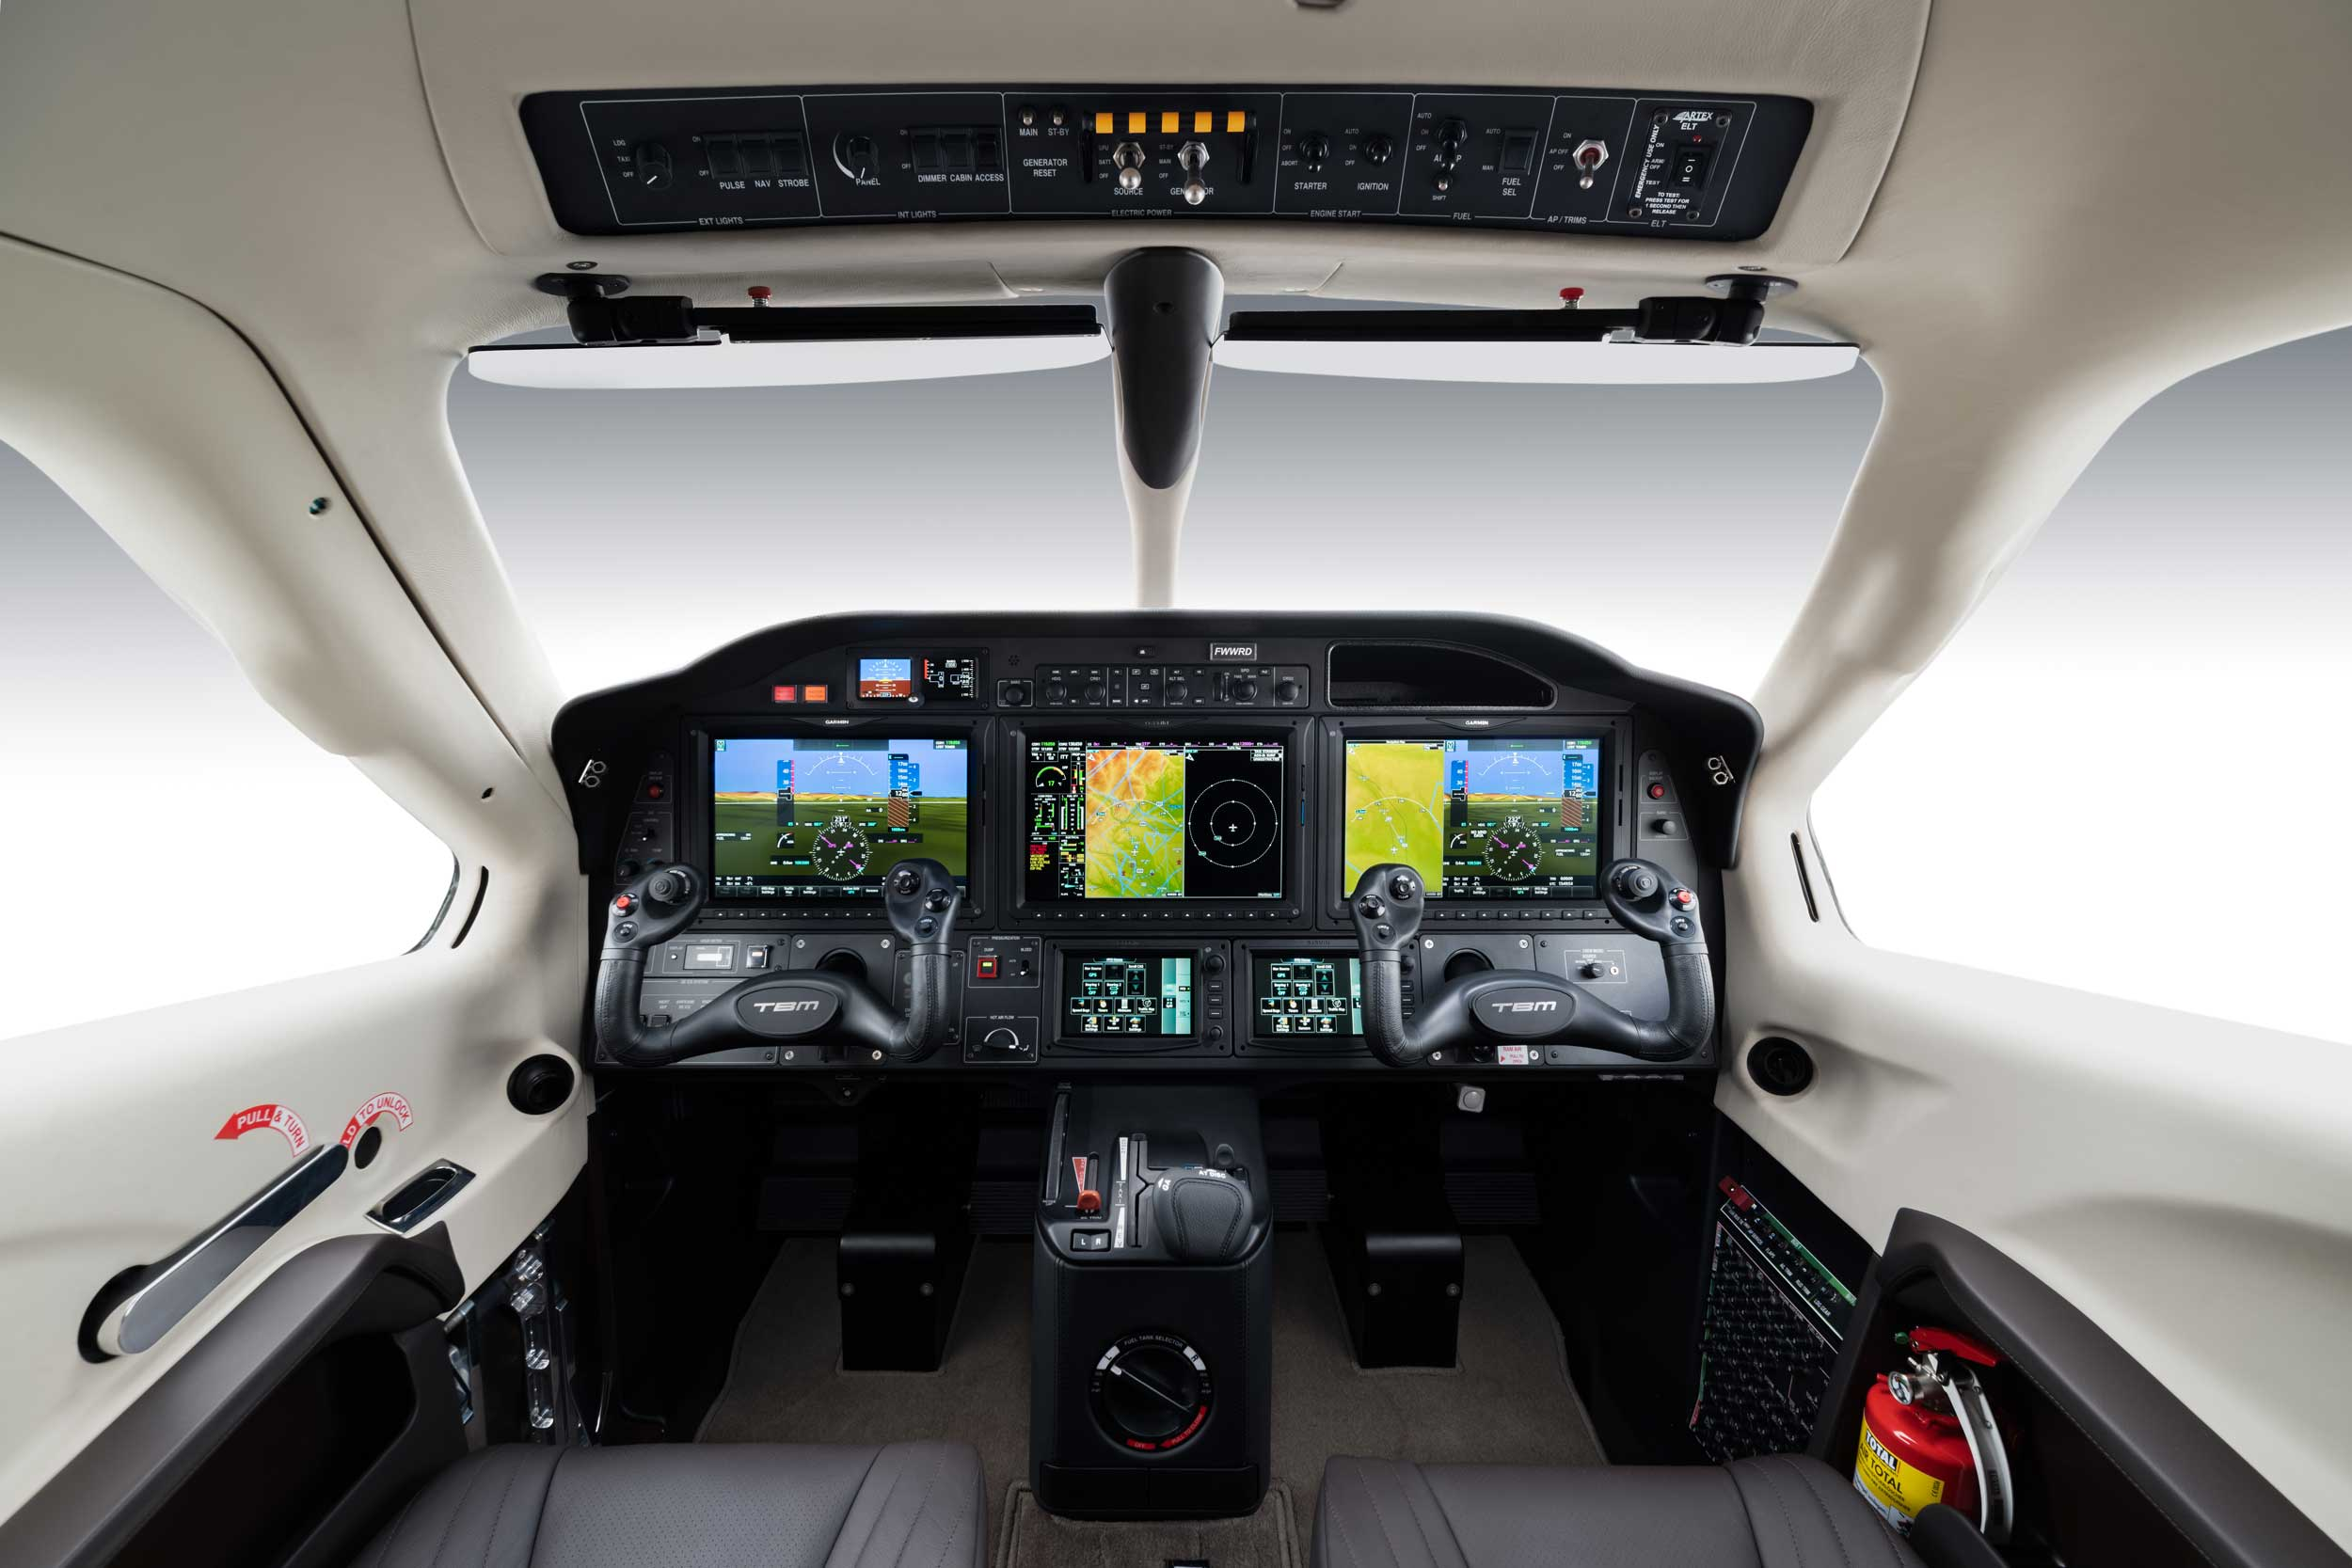 TBM 940 cockpit